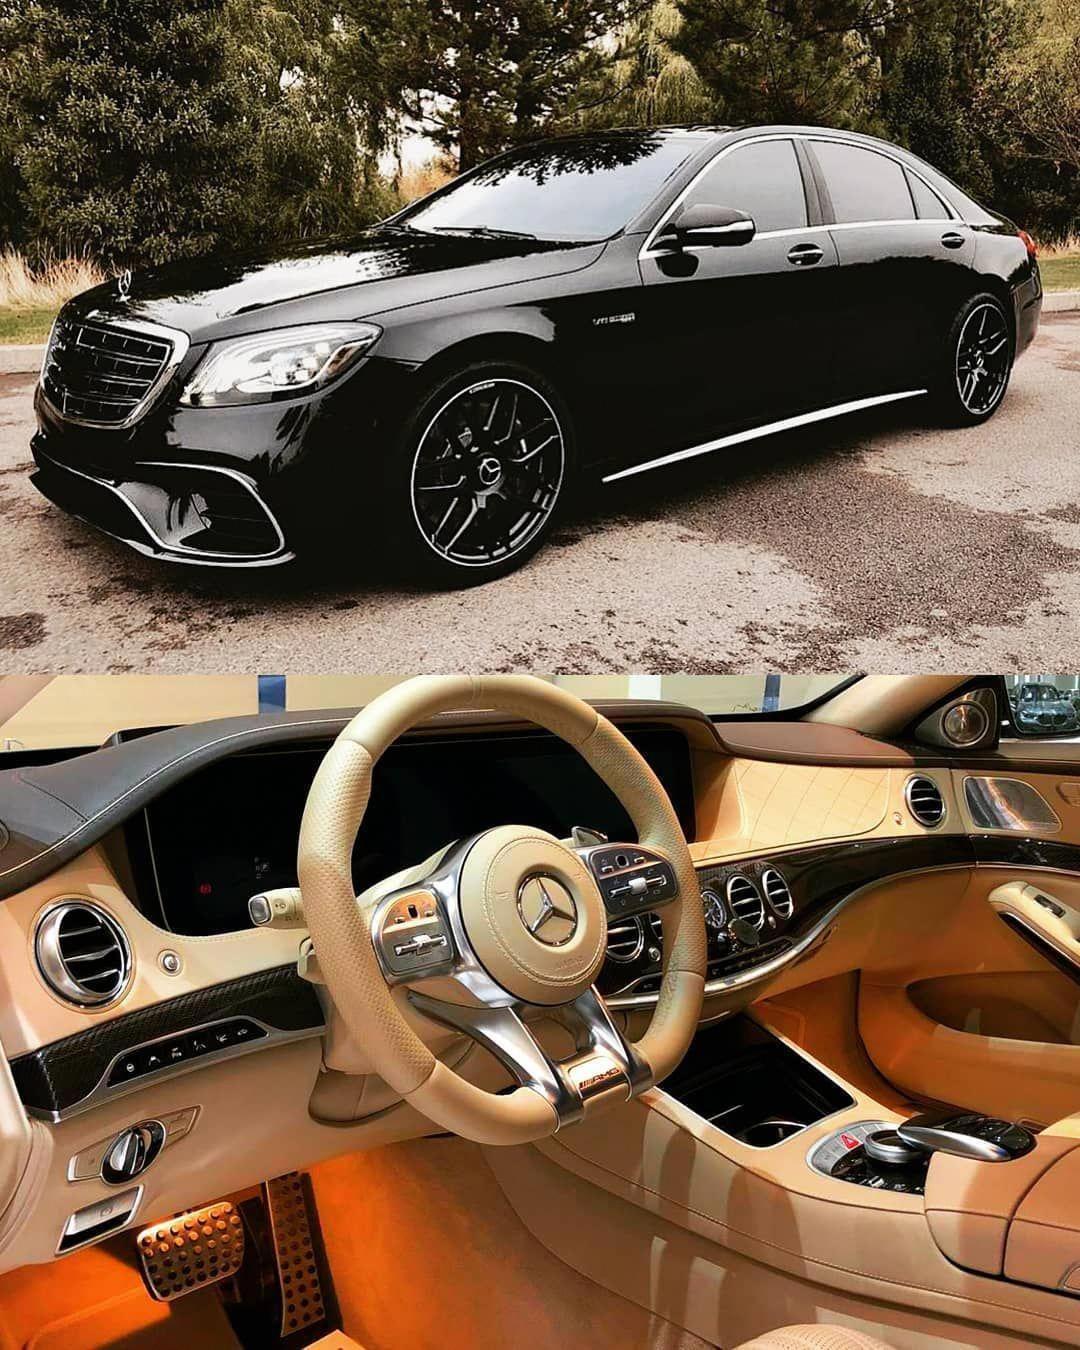 Mercedes Benz Amg S63 Follow Uber Luxury For More Via: Mercedes Benz S63 AMG W222 👑👑👑 Beige Luxury Interior